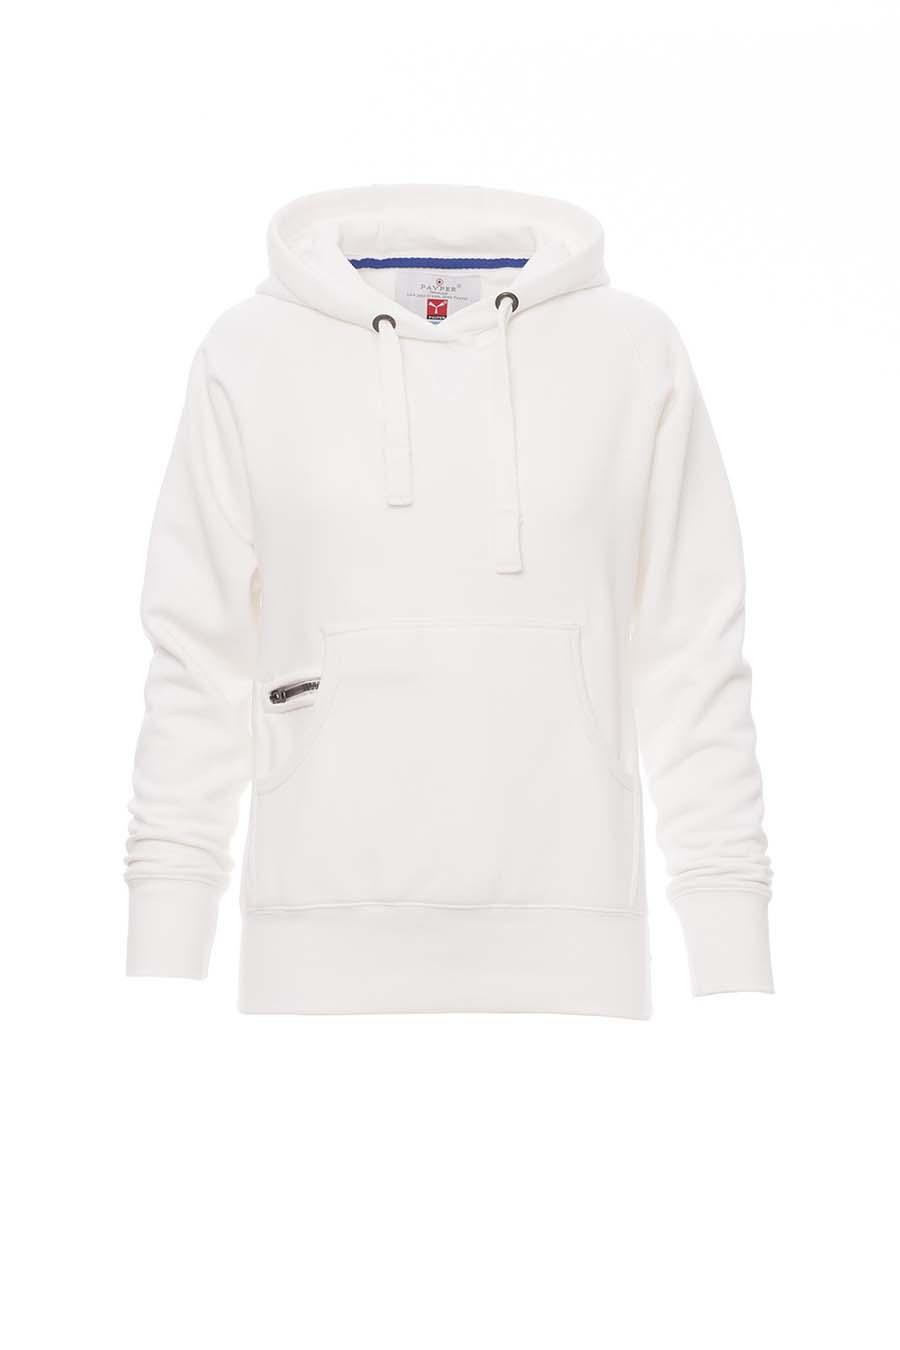 Sweat-shirt femme Atlanta - 32-1154-37